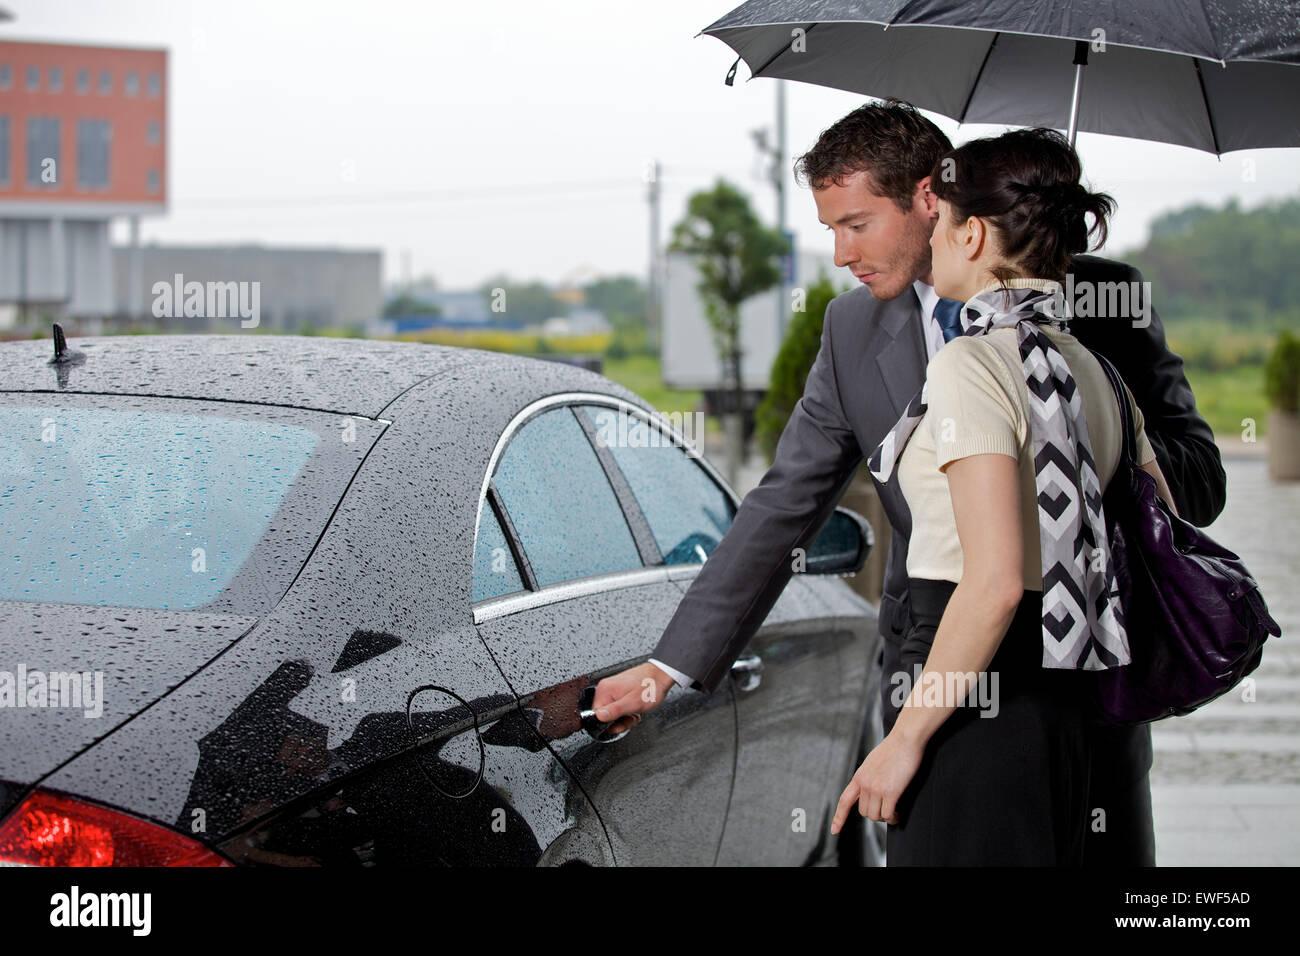 Joven abrir la puerta del coche para mujer Imagen De Stock